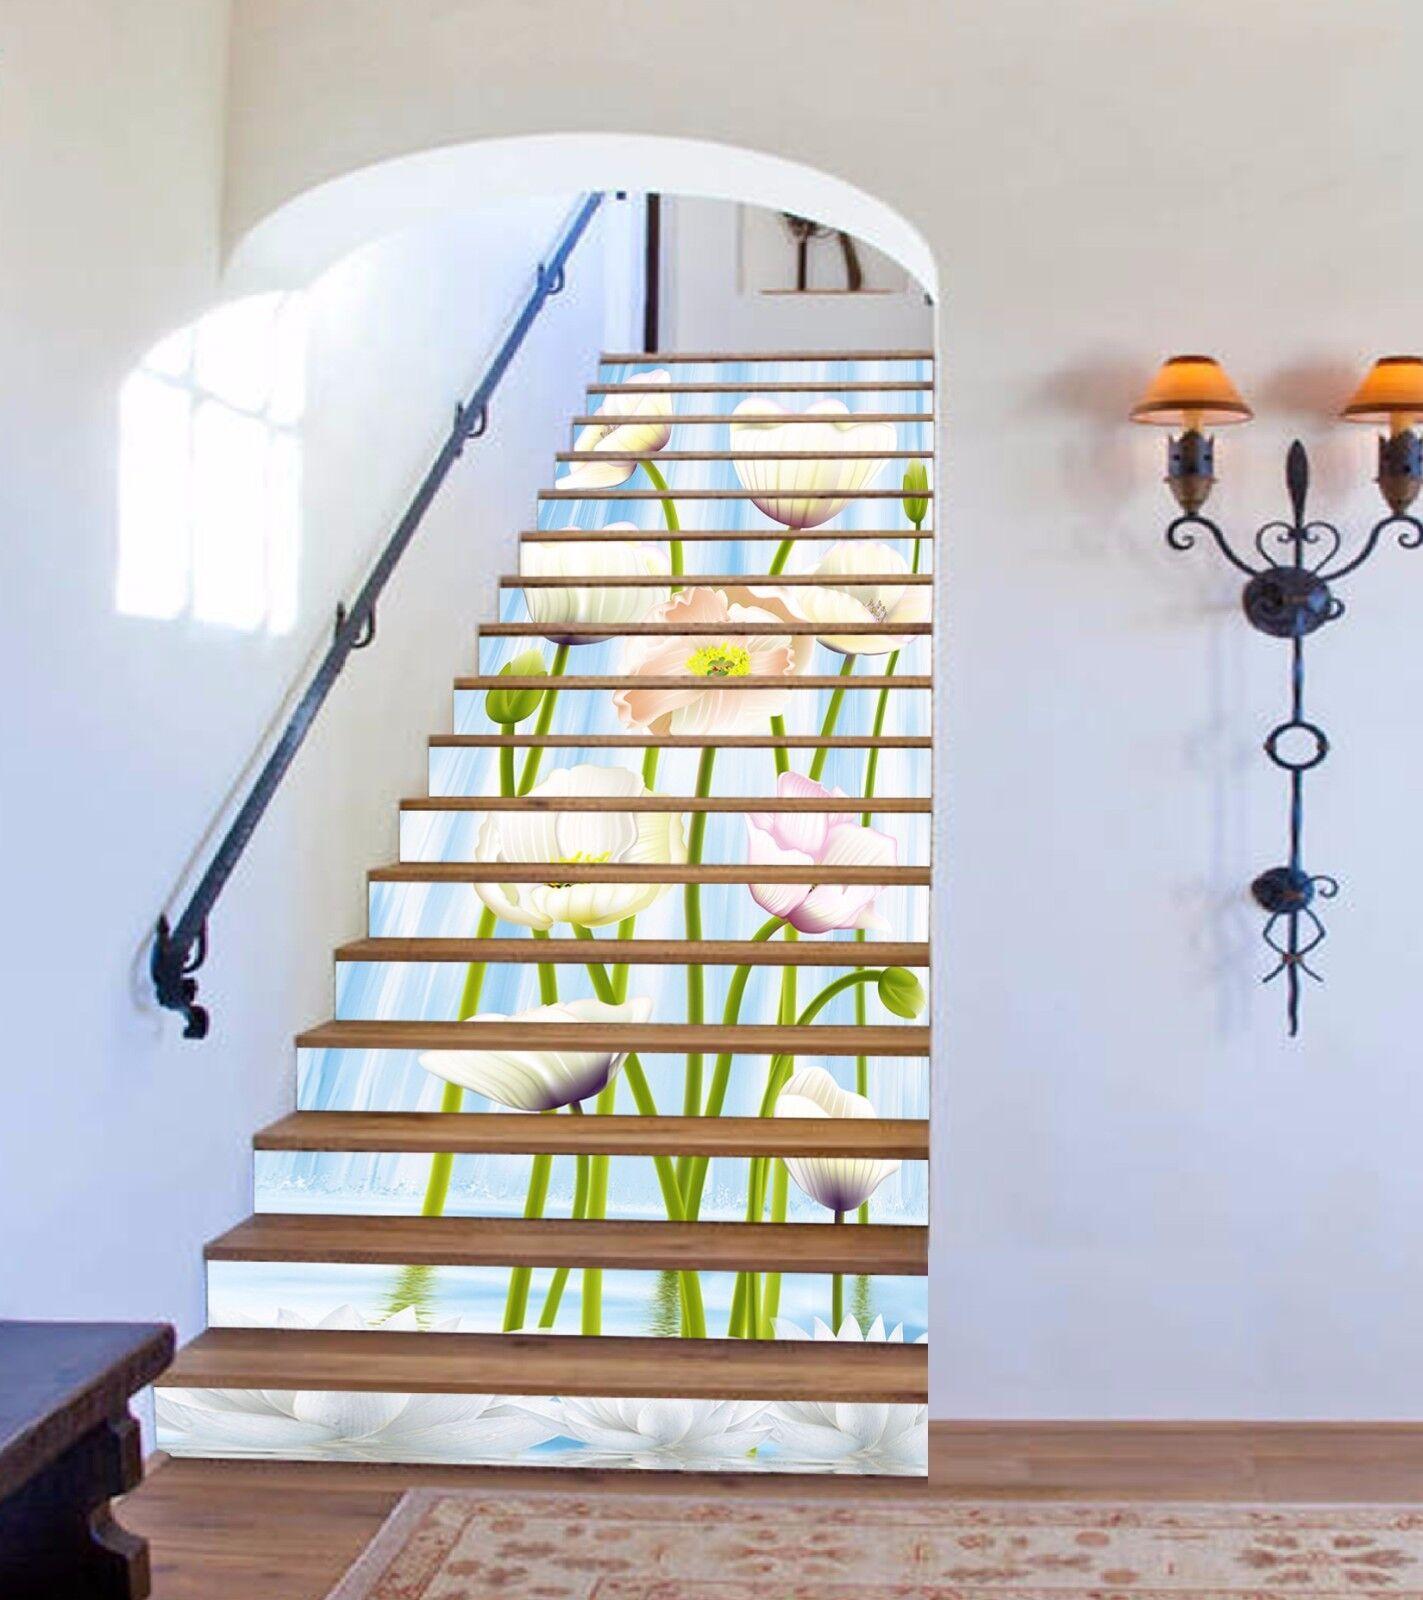 3D Flowering 631 Stair Risers Decoration Photo Mural Vinyl Decal Wallpaper UK